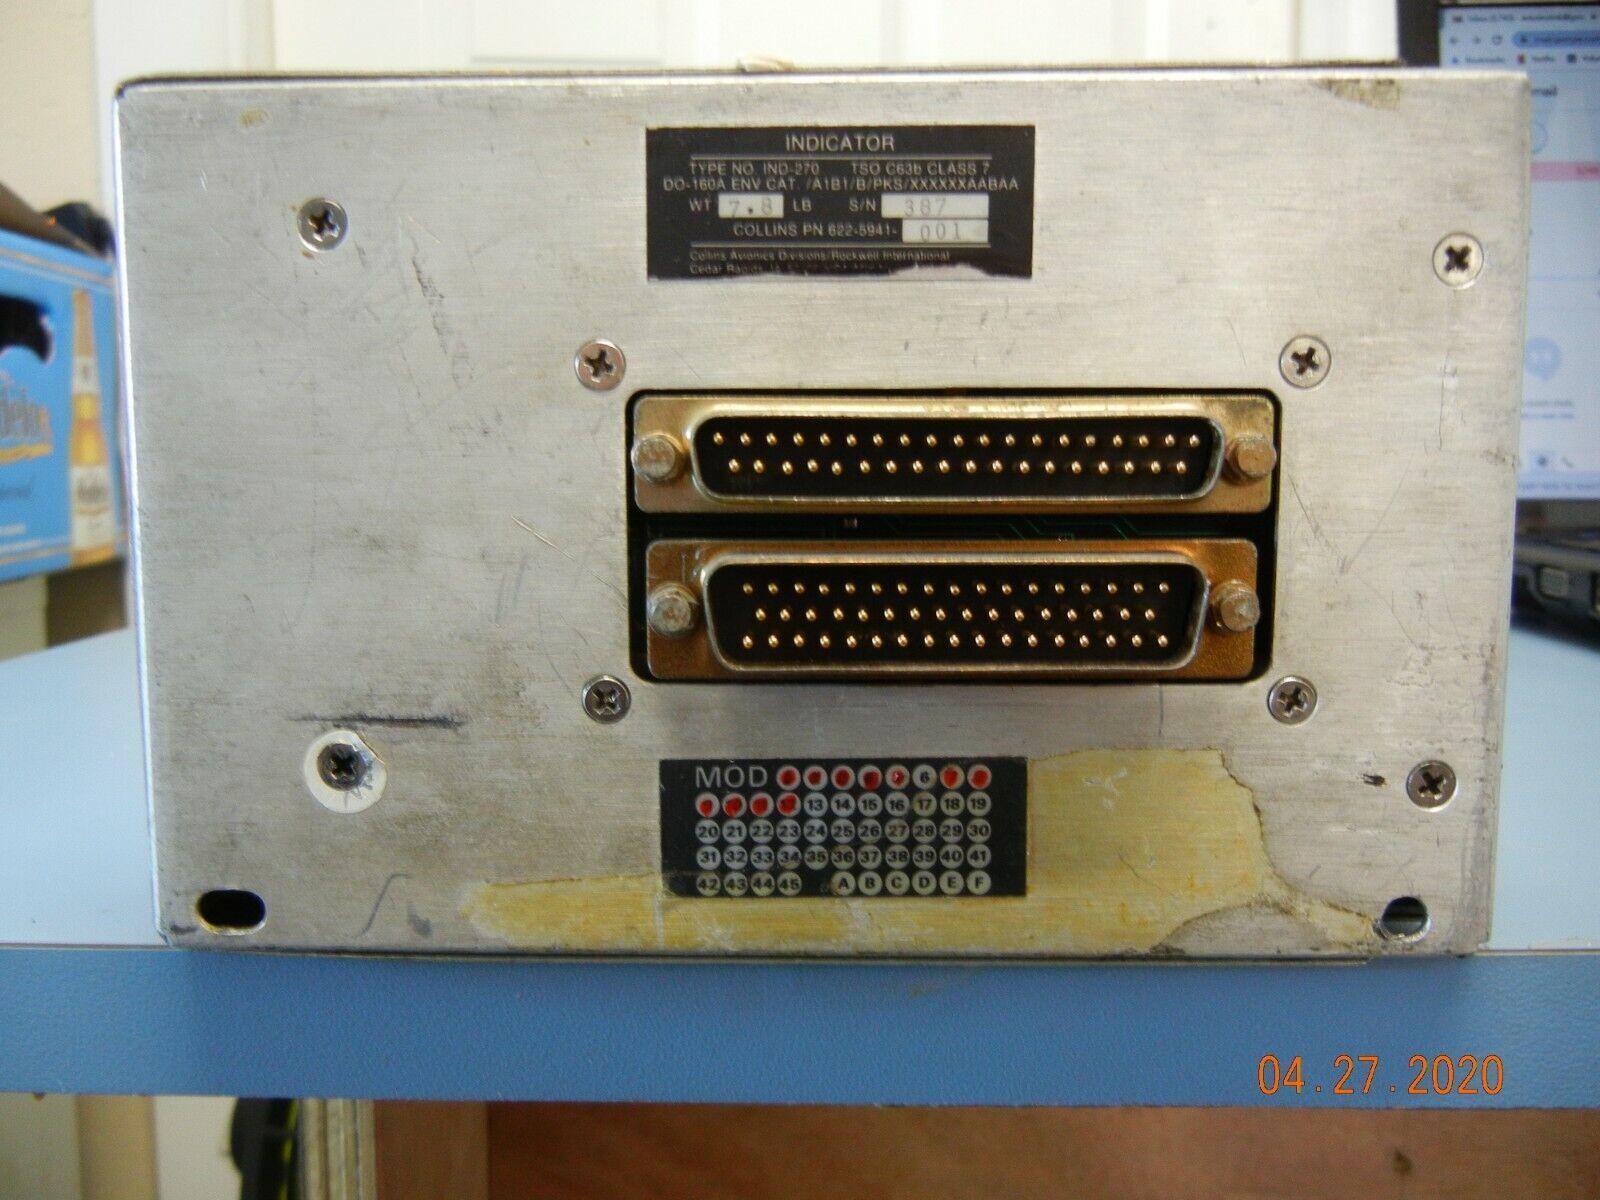 Collins Radar Indicator IND-270 P/N 622-5941-001